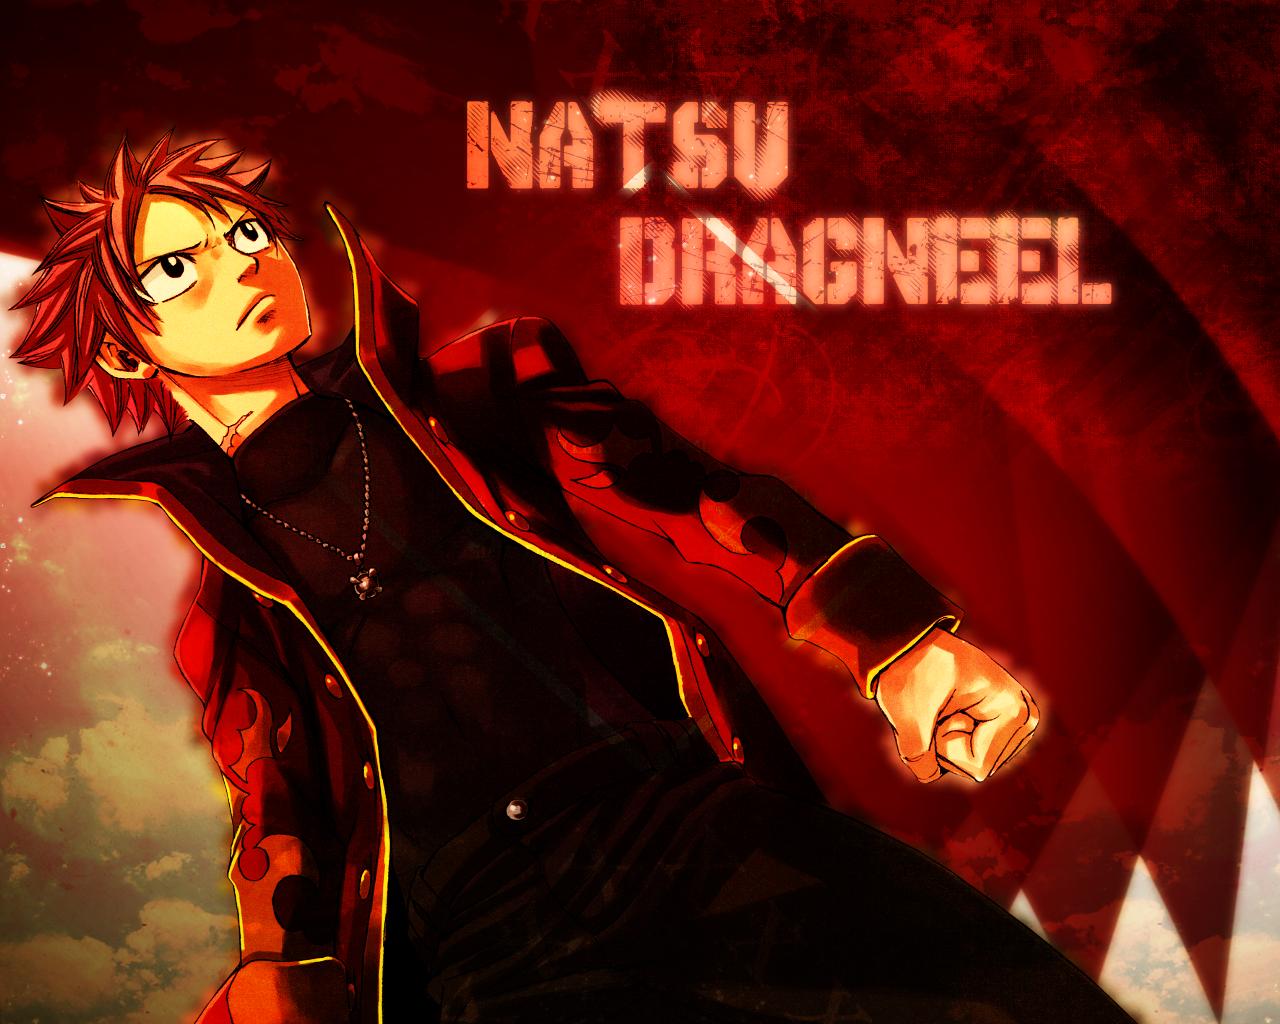 Fairy Tail Natsu Dragneel WALLPAPER by SilasTsunayoshi